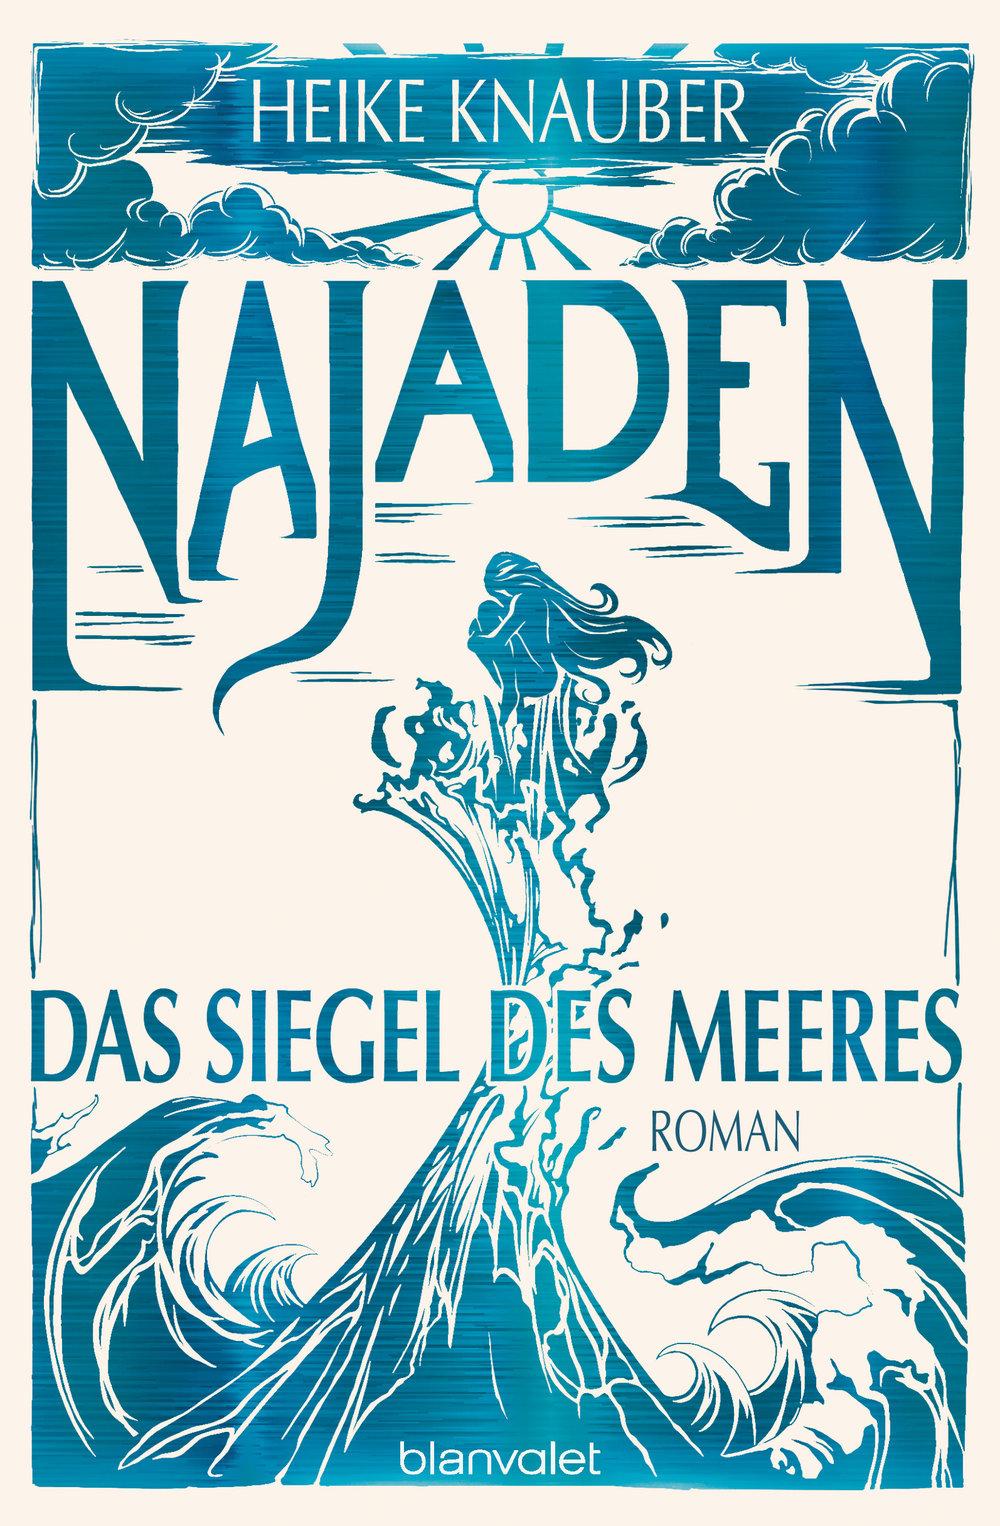 Najaden-Das-Siegel-des-Meeres_Heike-Knauber.jpg